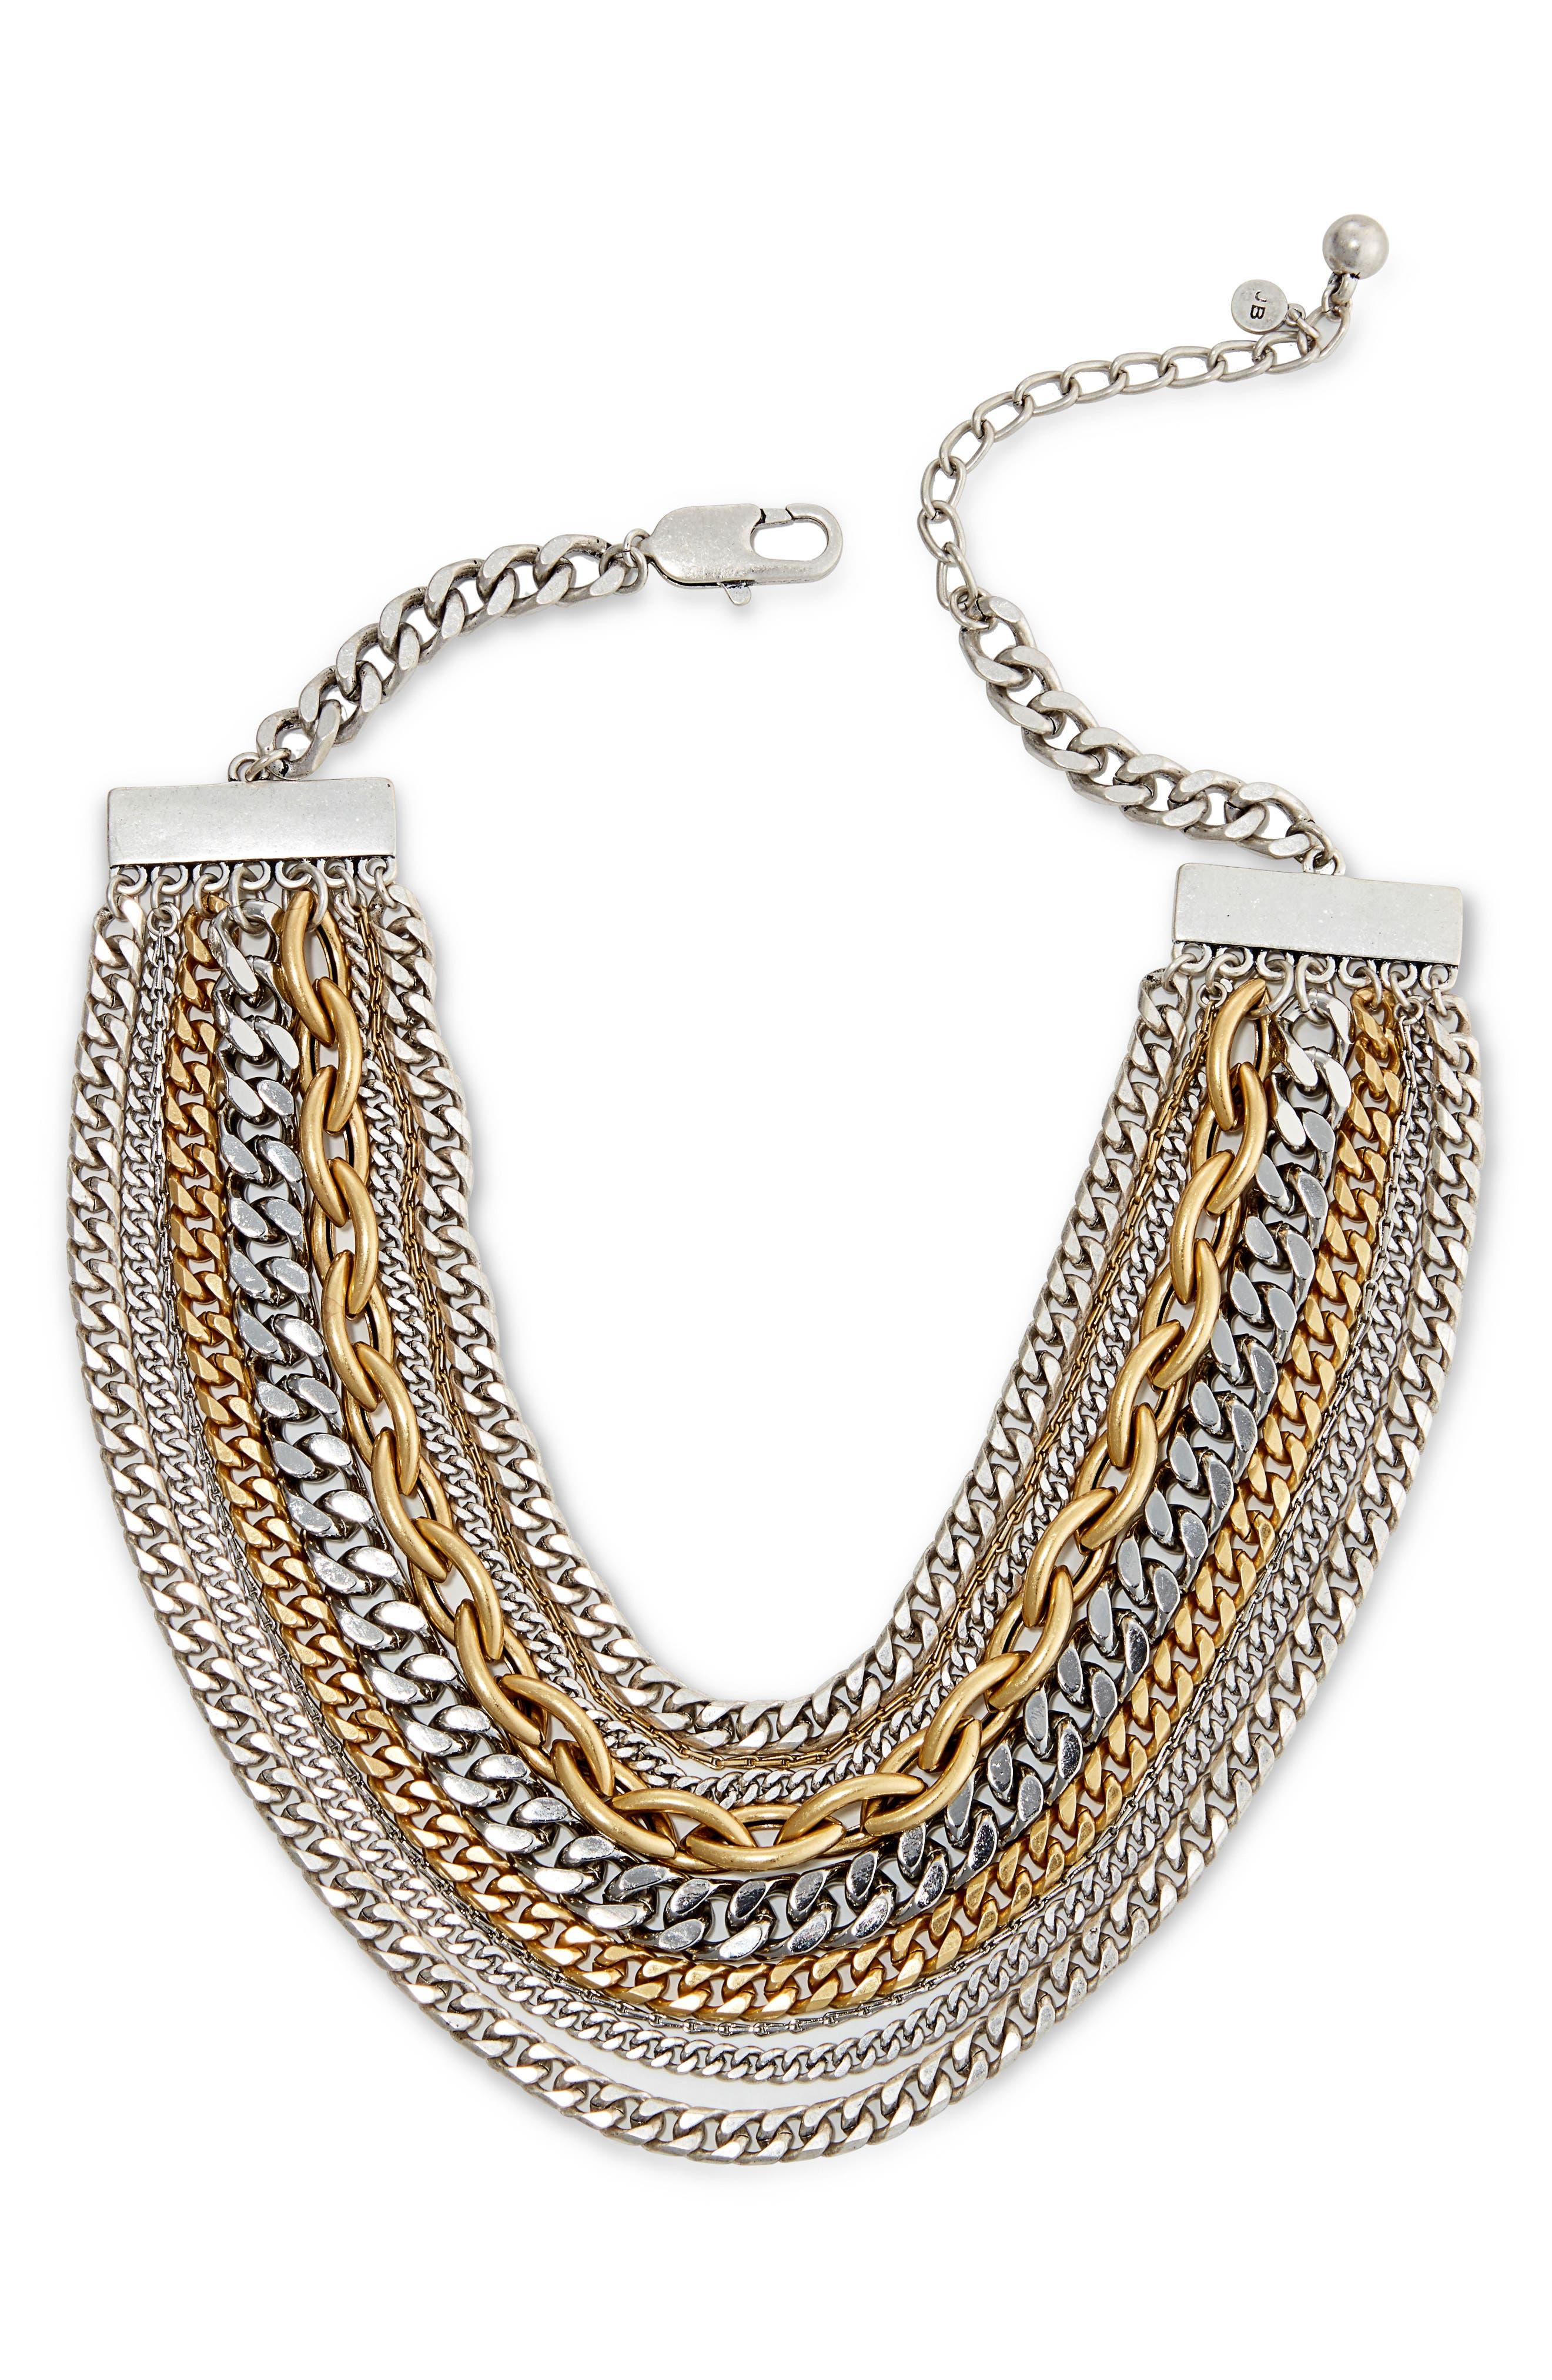 Marra Collar Necklace,                             Alternate thumbnail 2, color,                             040